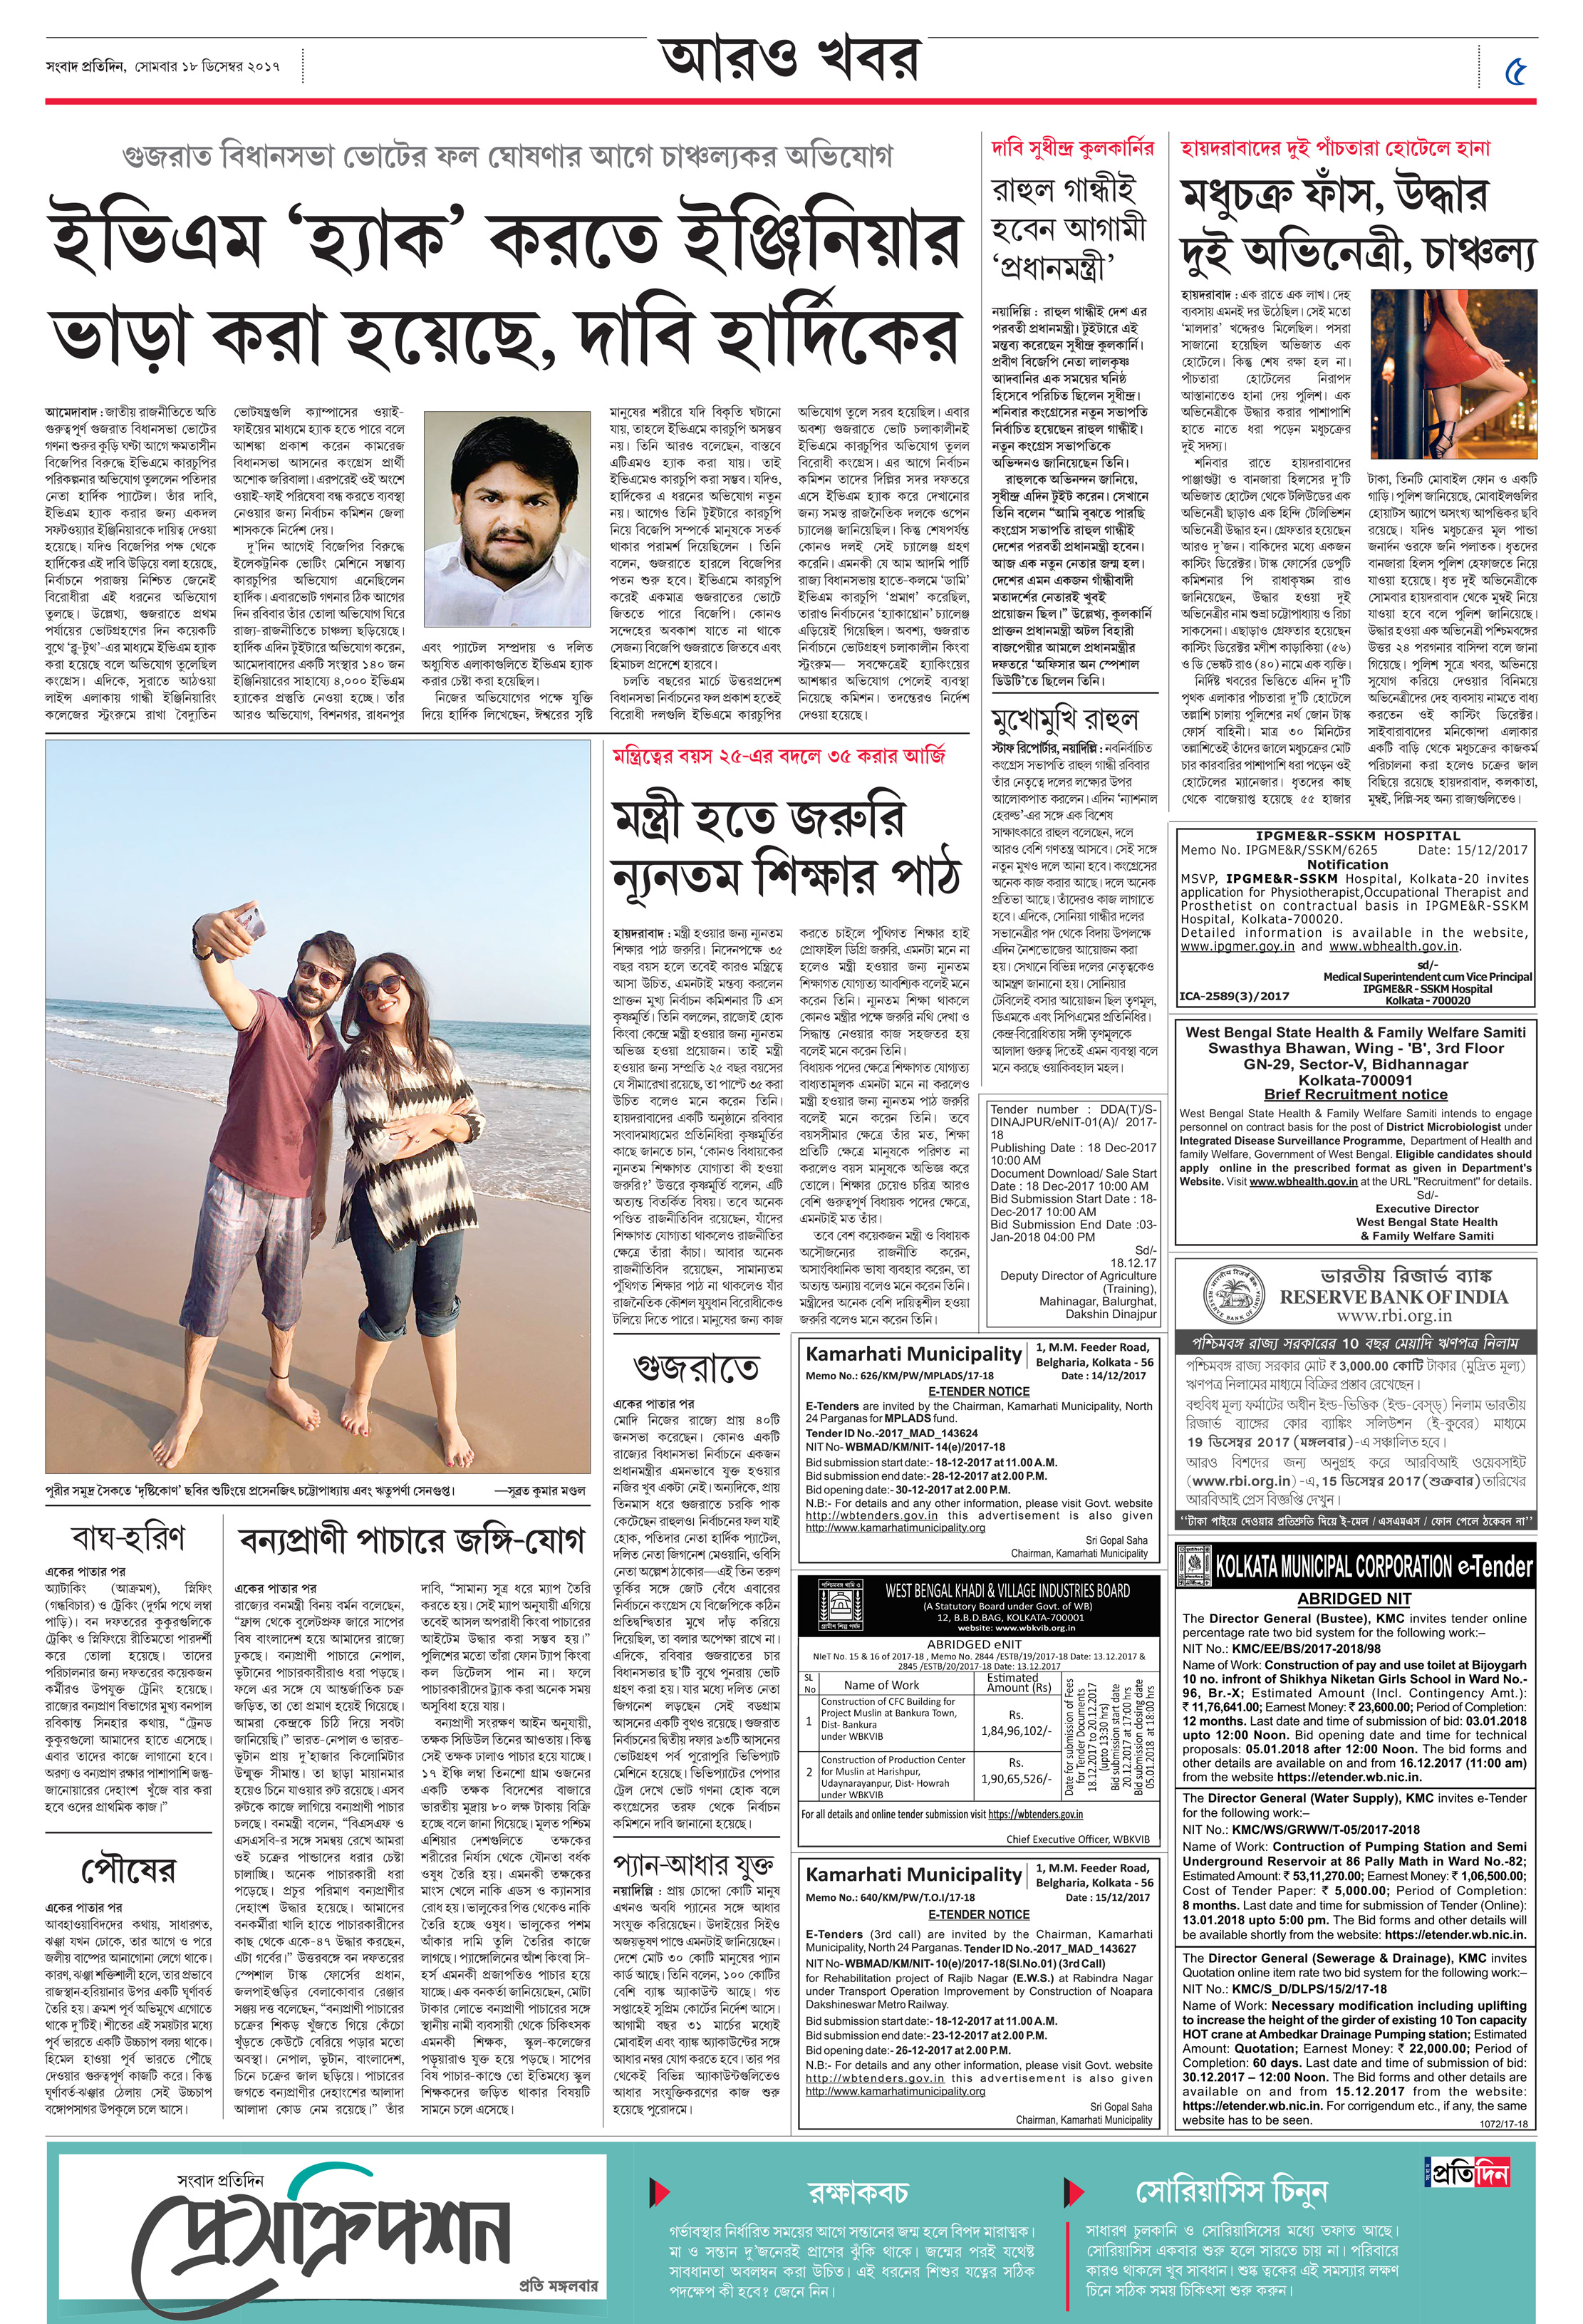 Sangbad Pratidin 18-12-17 Page: 5